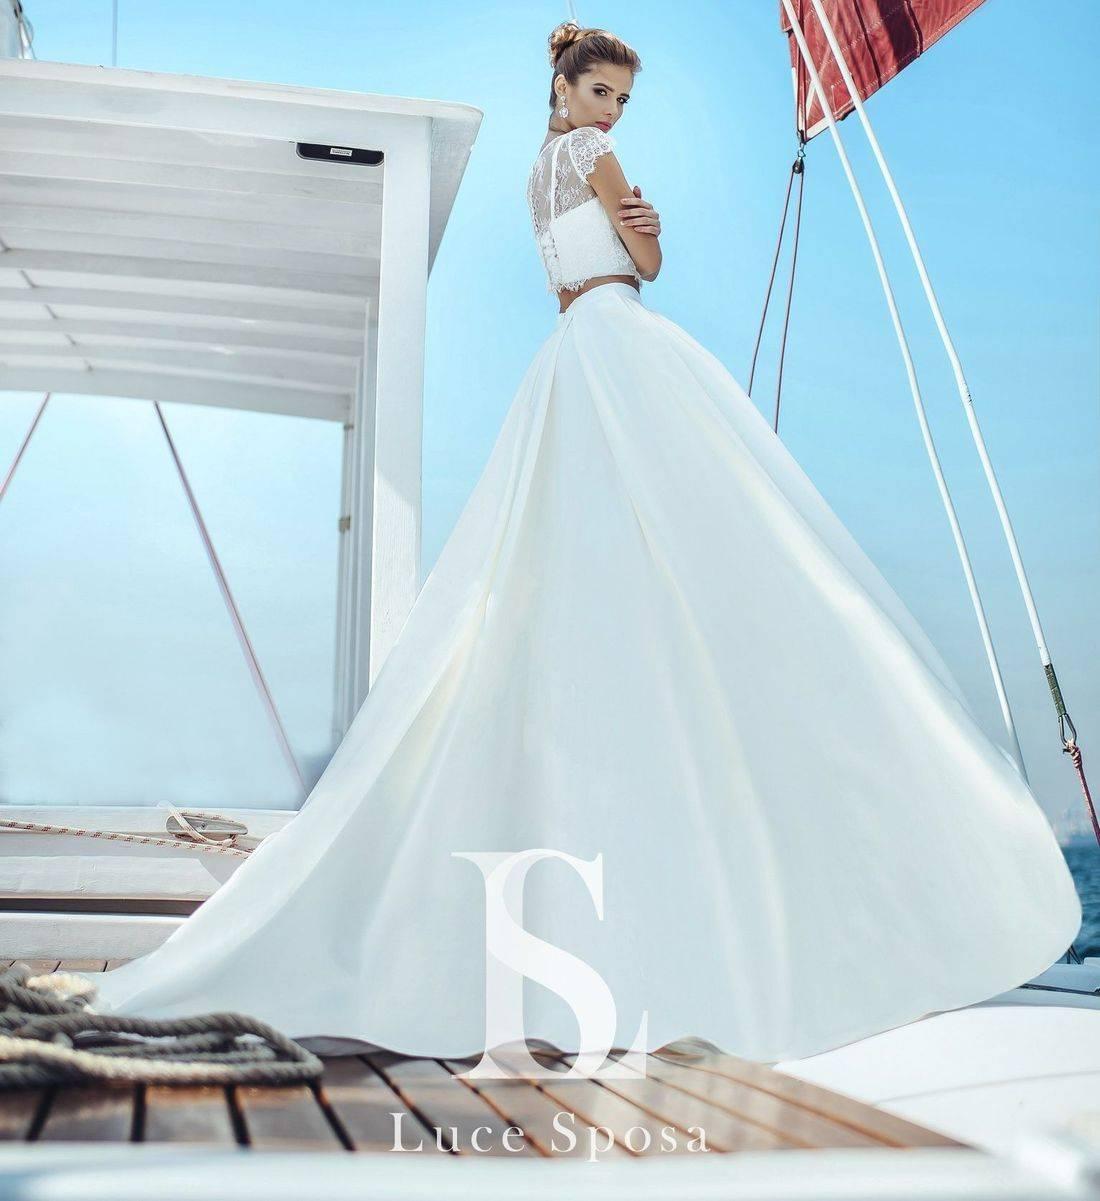 affordable wedding dresses,simple wedding dress,modest wedding dress,wedding dresses